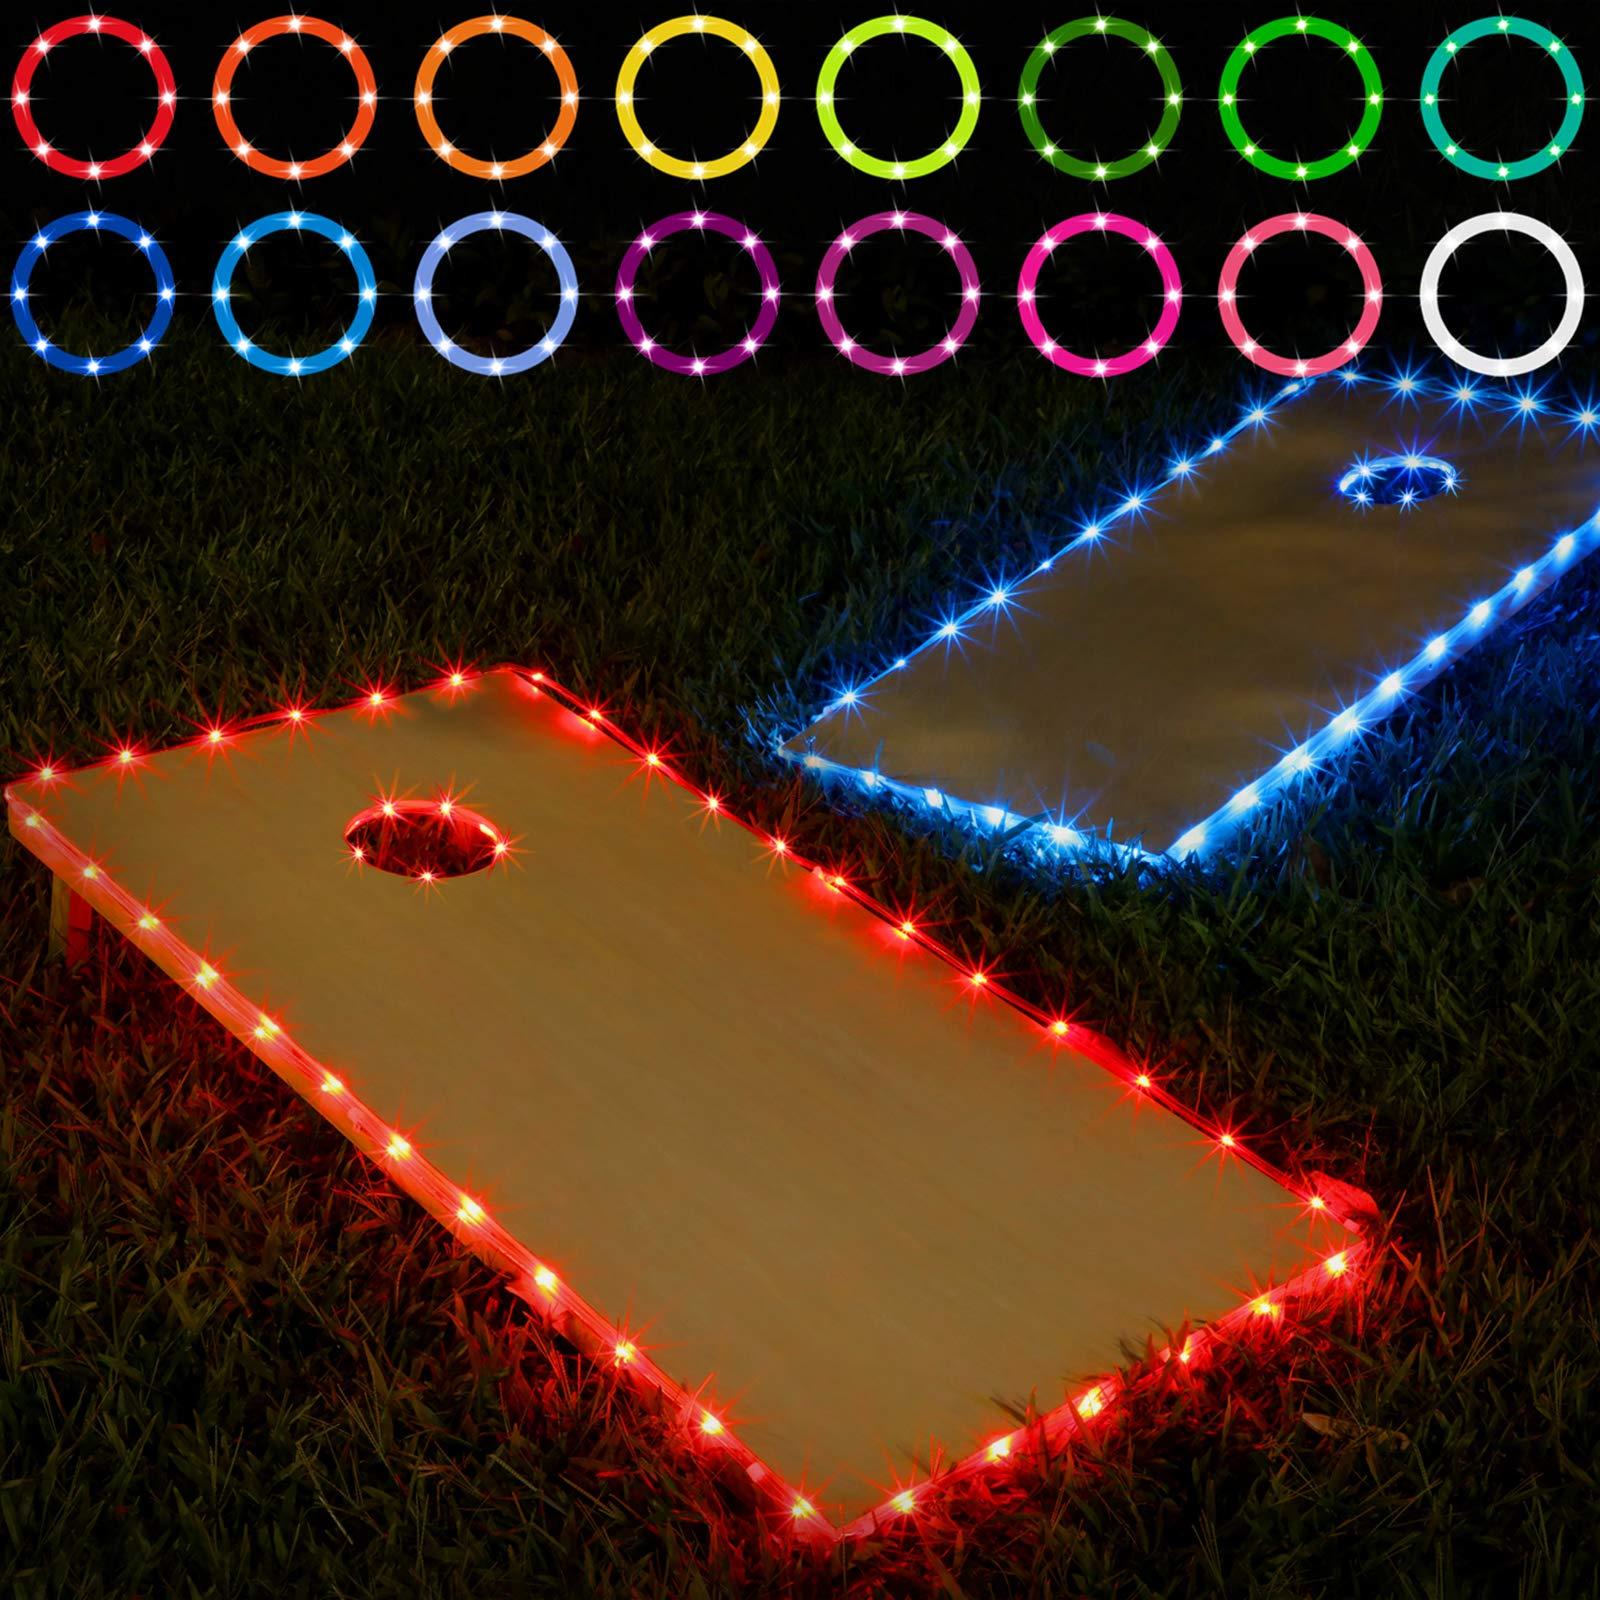 Blinngo Cornhole Lights Cornhole Led Lights fit for Cornhole Boards Ring Lights and Edge Lights for Family Backyard Bean Bag Toss Cornhole Game